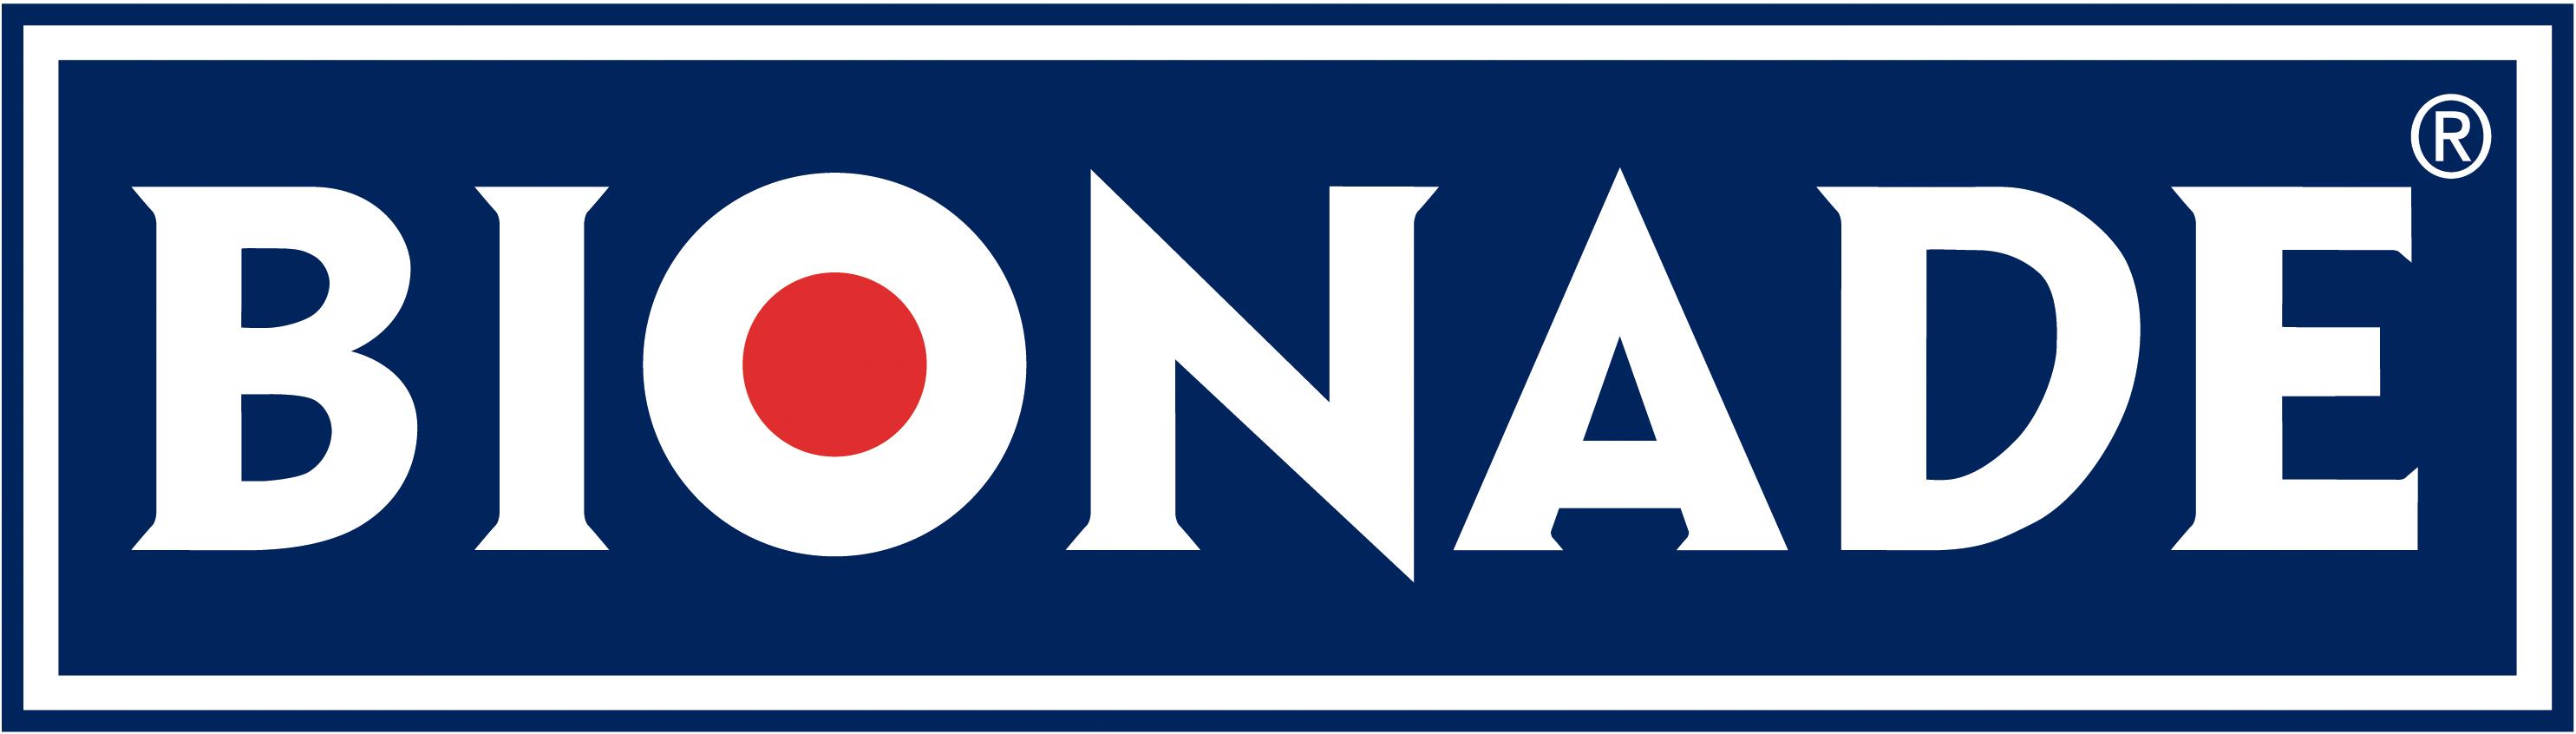 http://www.getraenke-reichle.de/data/media/1/144_846x2970_BIONADE_Logo_Rand_rgb.jpg